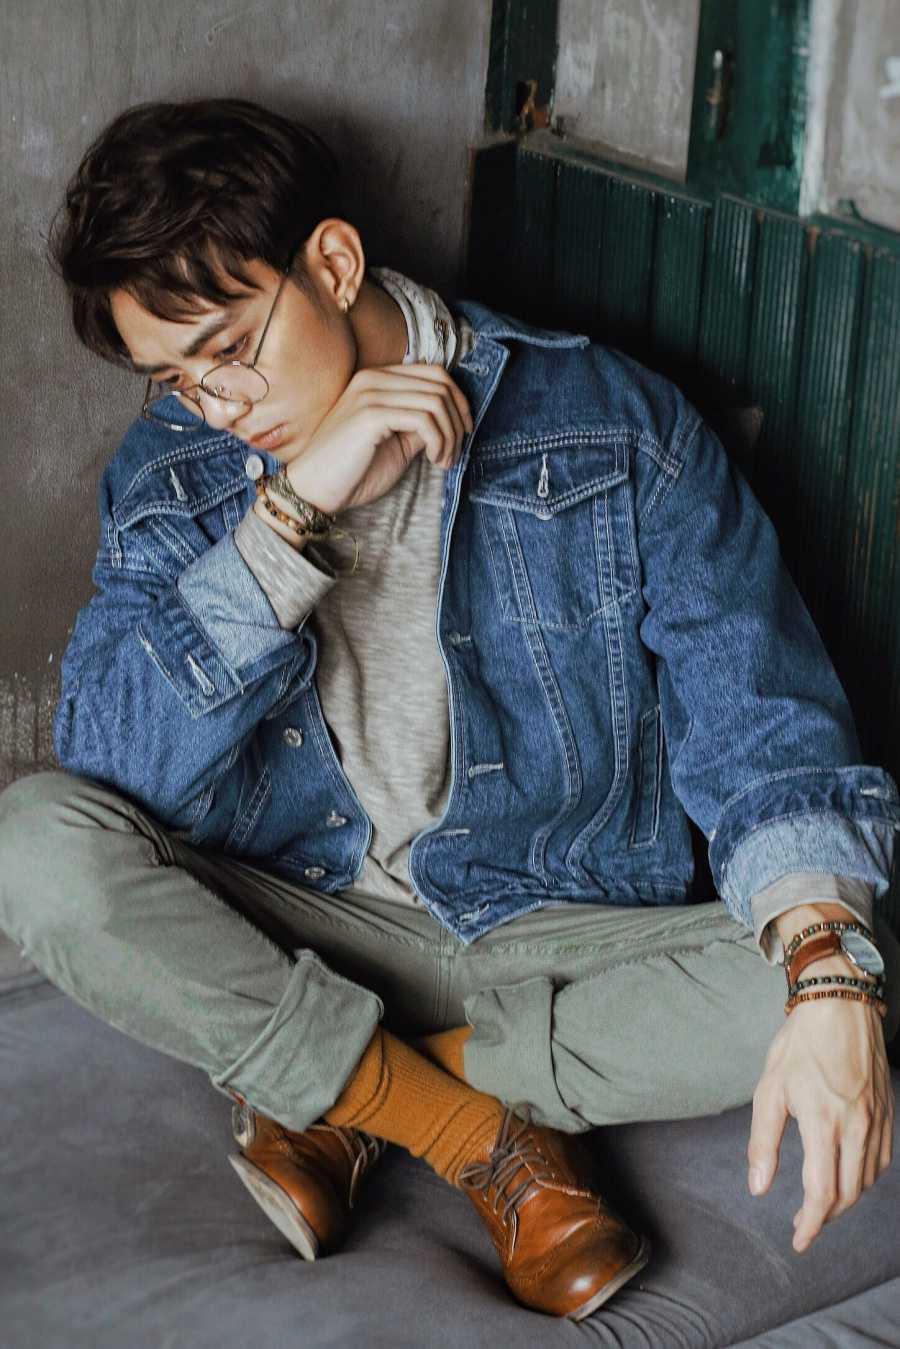 Hat ballad ngot ngao, Soobin Hoang Son khien fans 'ban loan' hinh anh 5